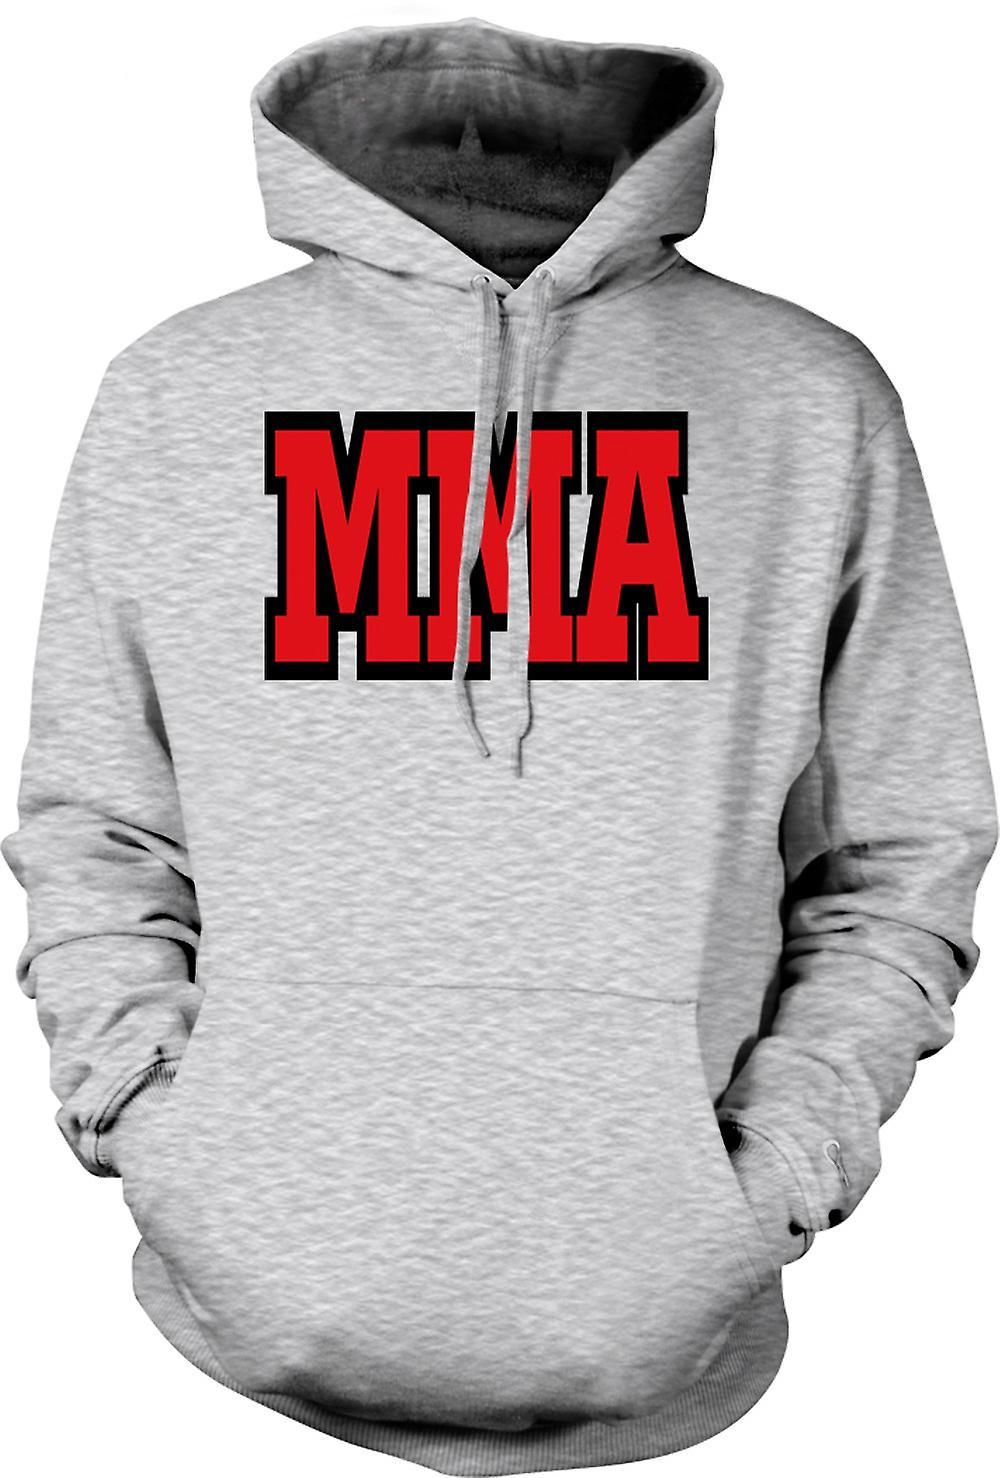 Mens Hoodie - MMA - Kampfkunst - Slogan